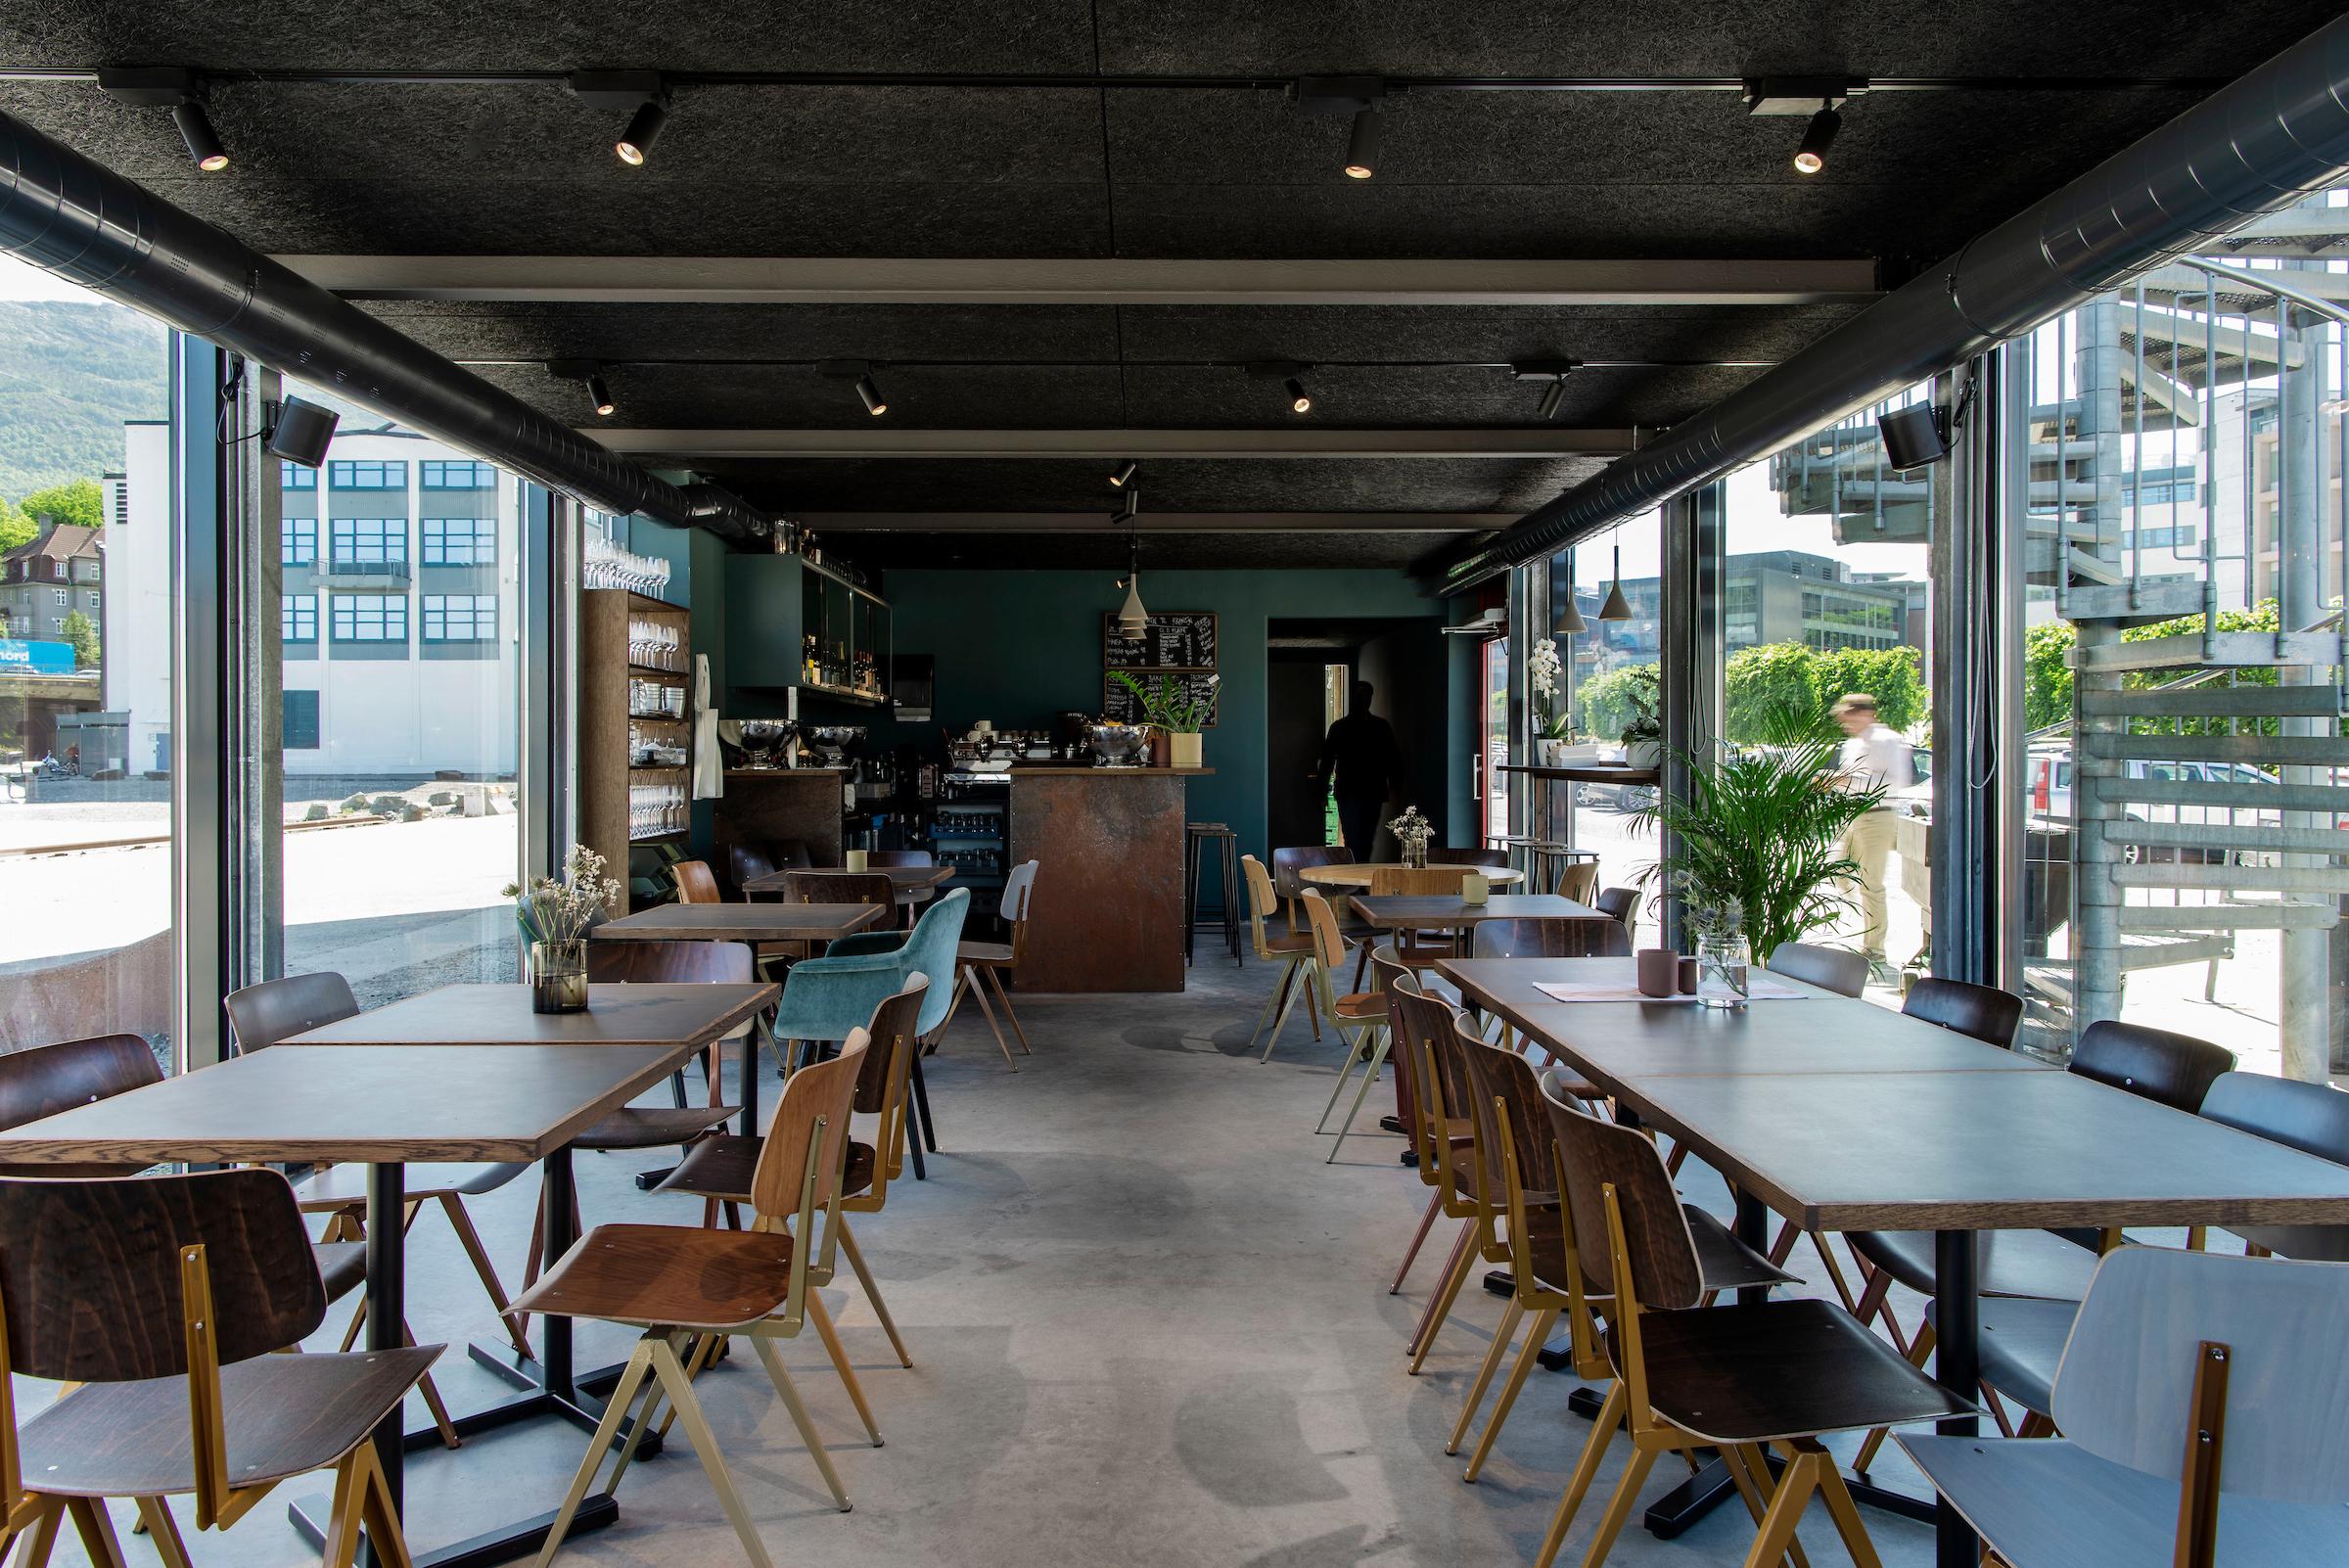 Colonialen kranen places to eat & drink in bergen